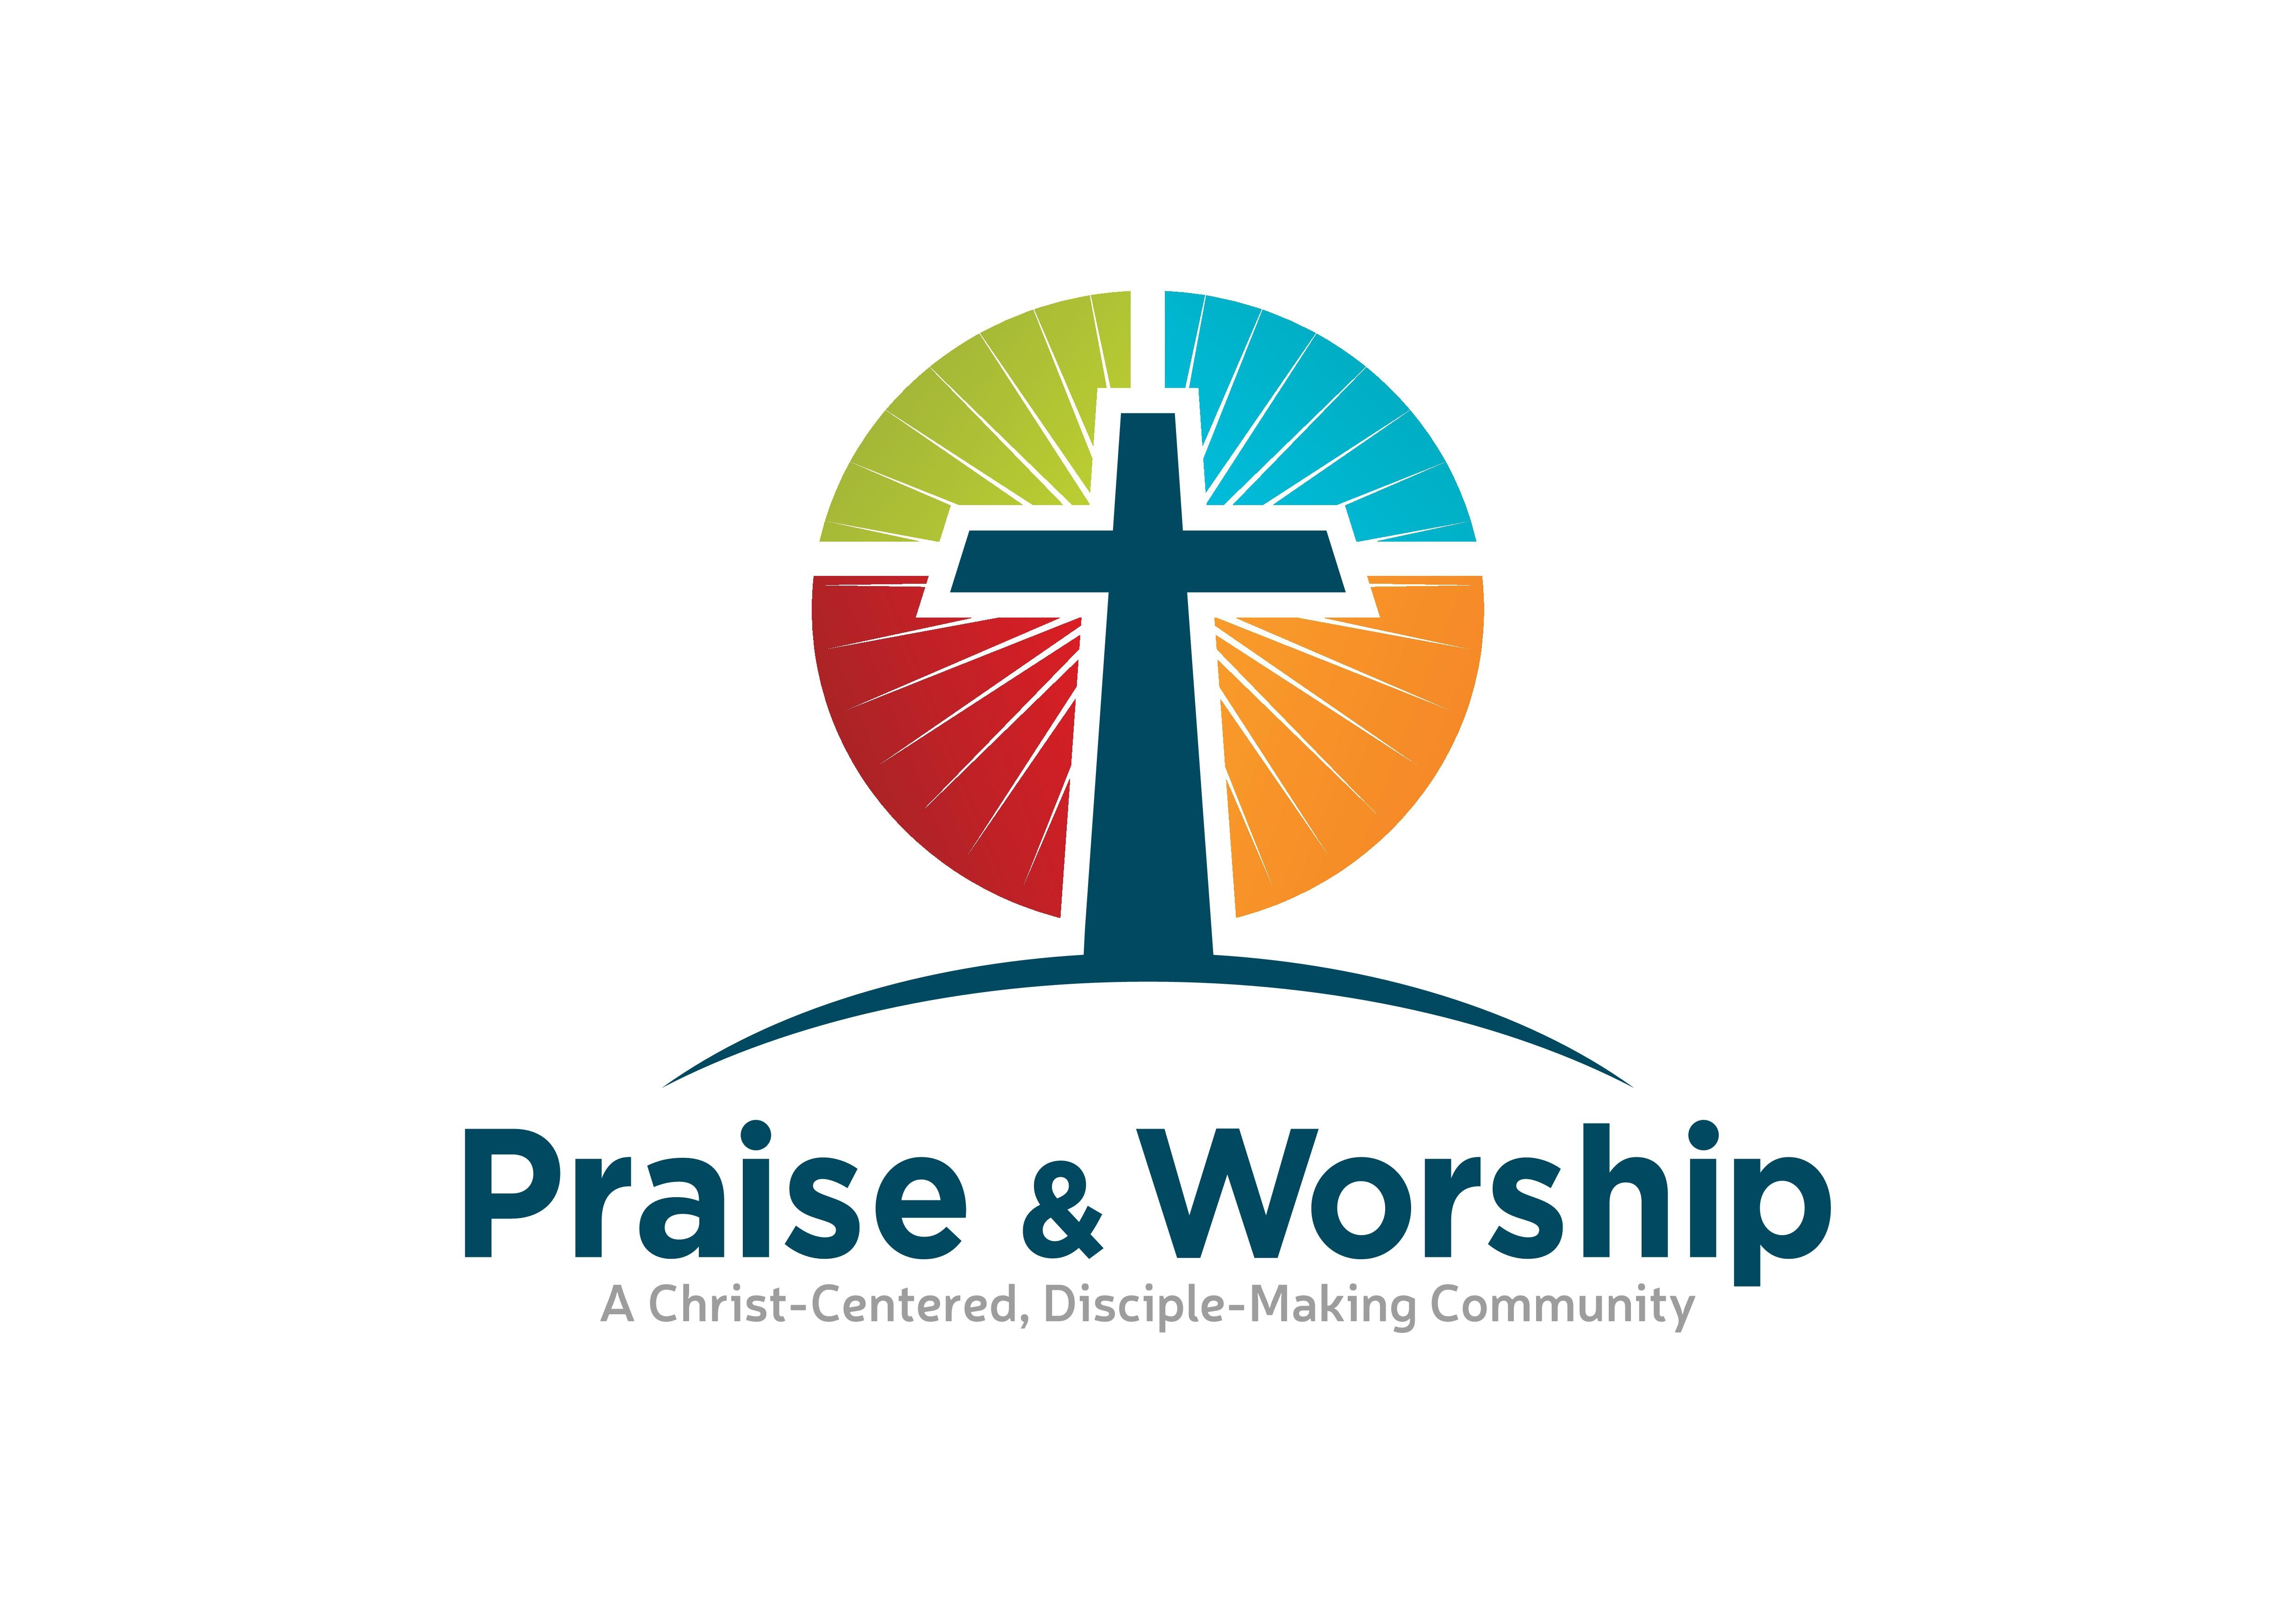 Help a new church create a clean new logo for reaching the community.